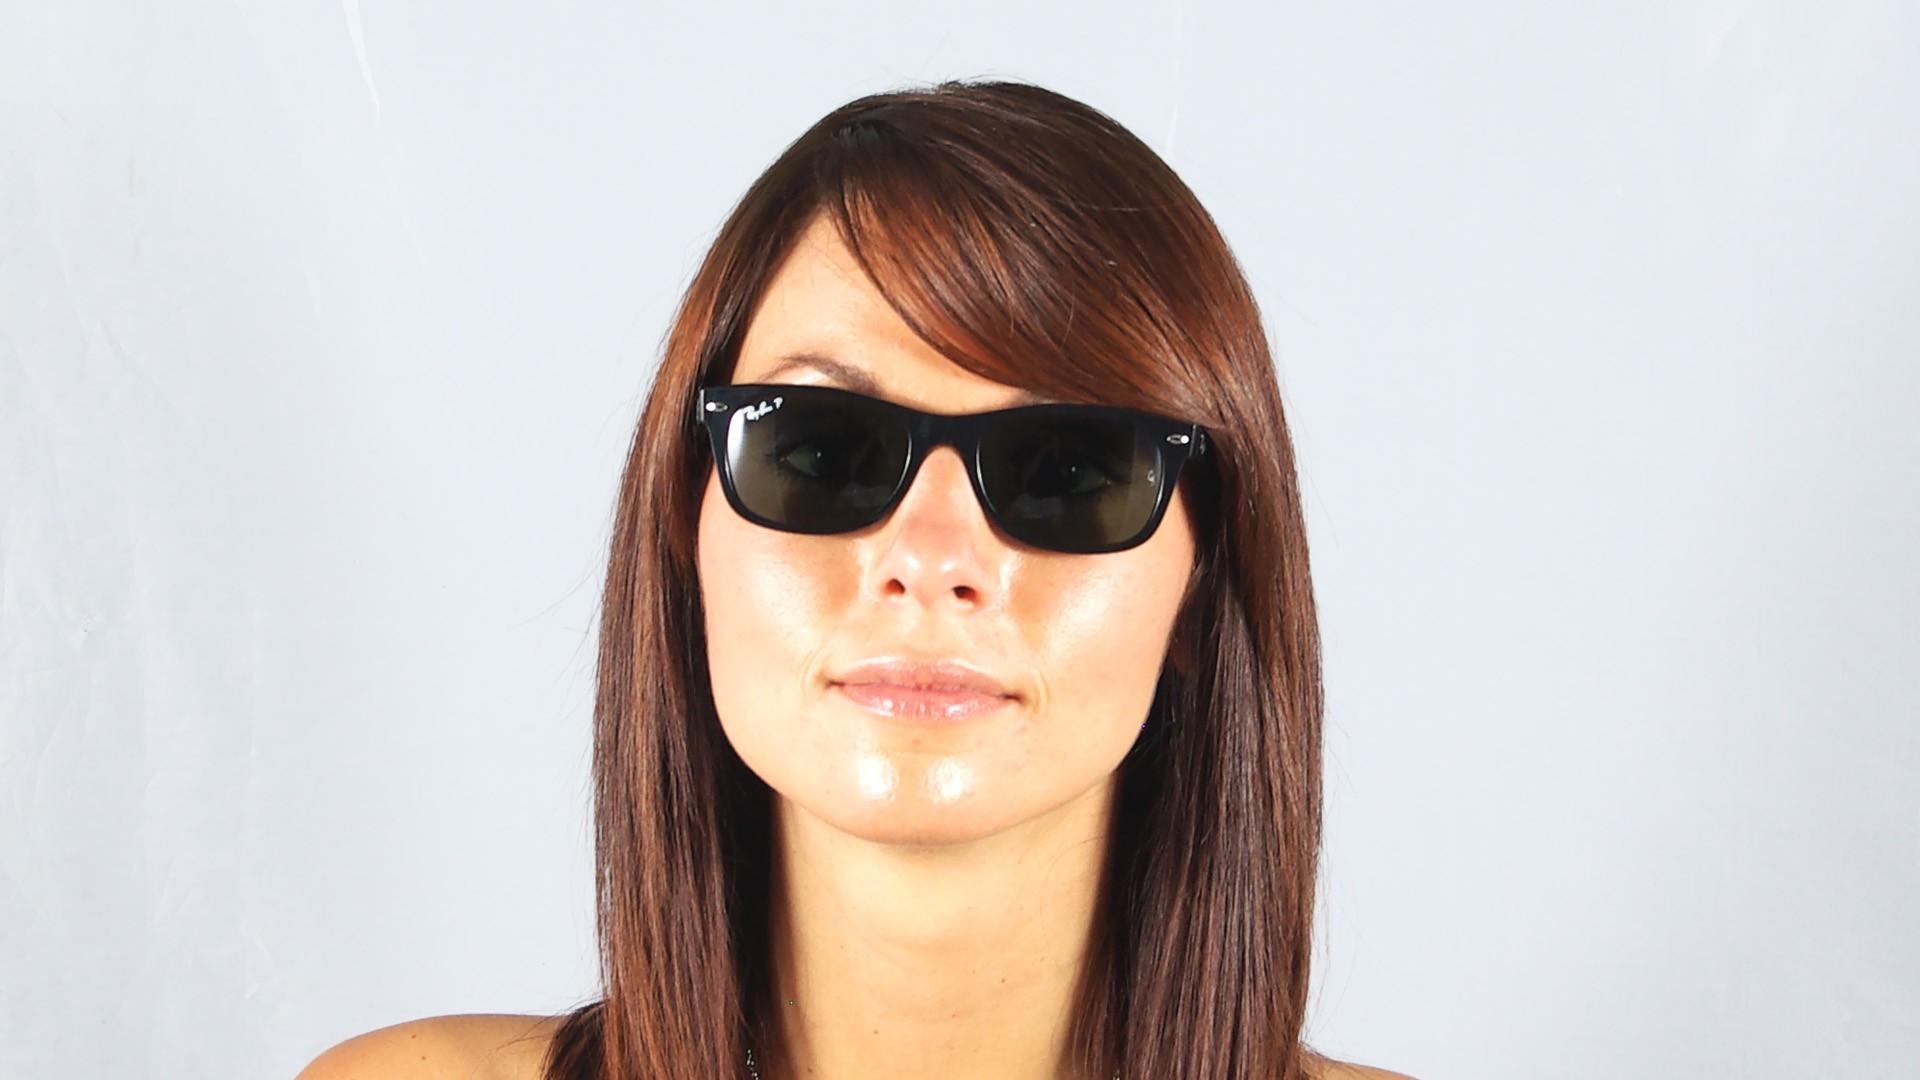 8a7509e493 Sunglasses Ray-Ban New Wayfarer Black G15 RB2132 901 58 52-18 Medium  Polarized